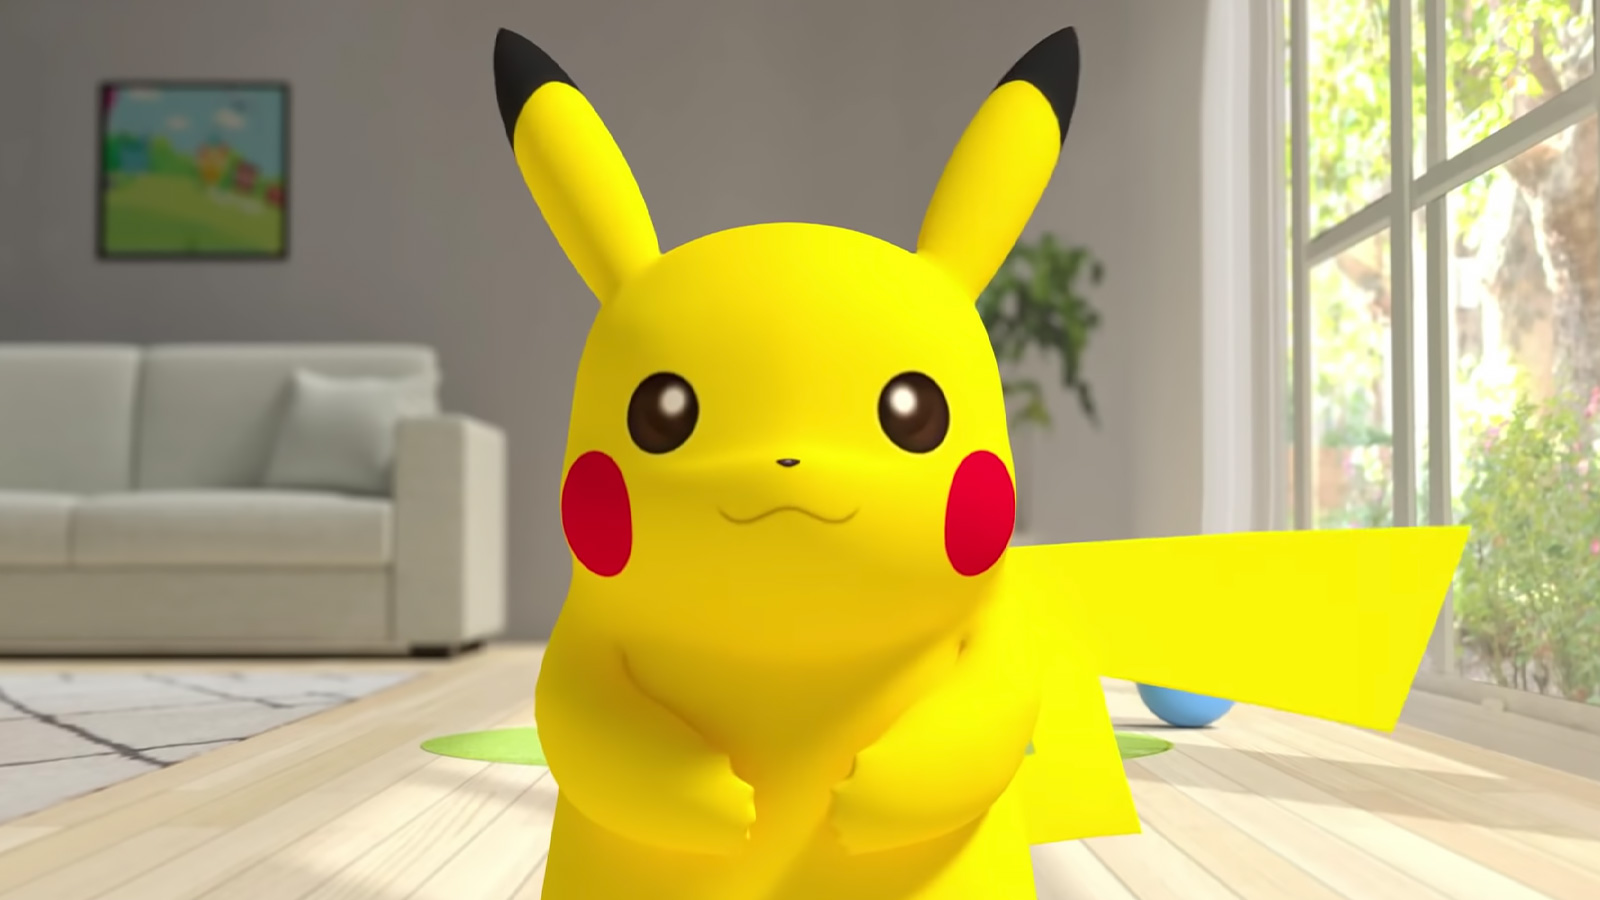 Screenshot of Pokemon mascot Pikachu doing ASMR on YouTube.